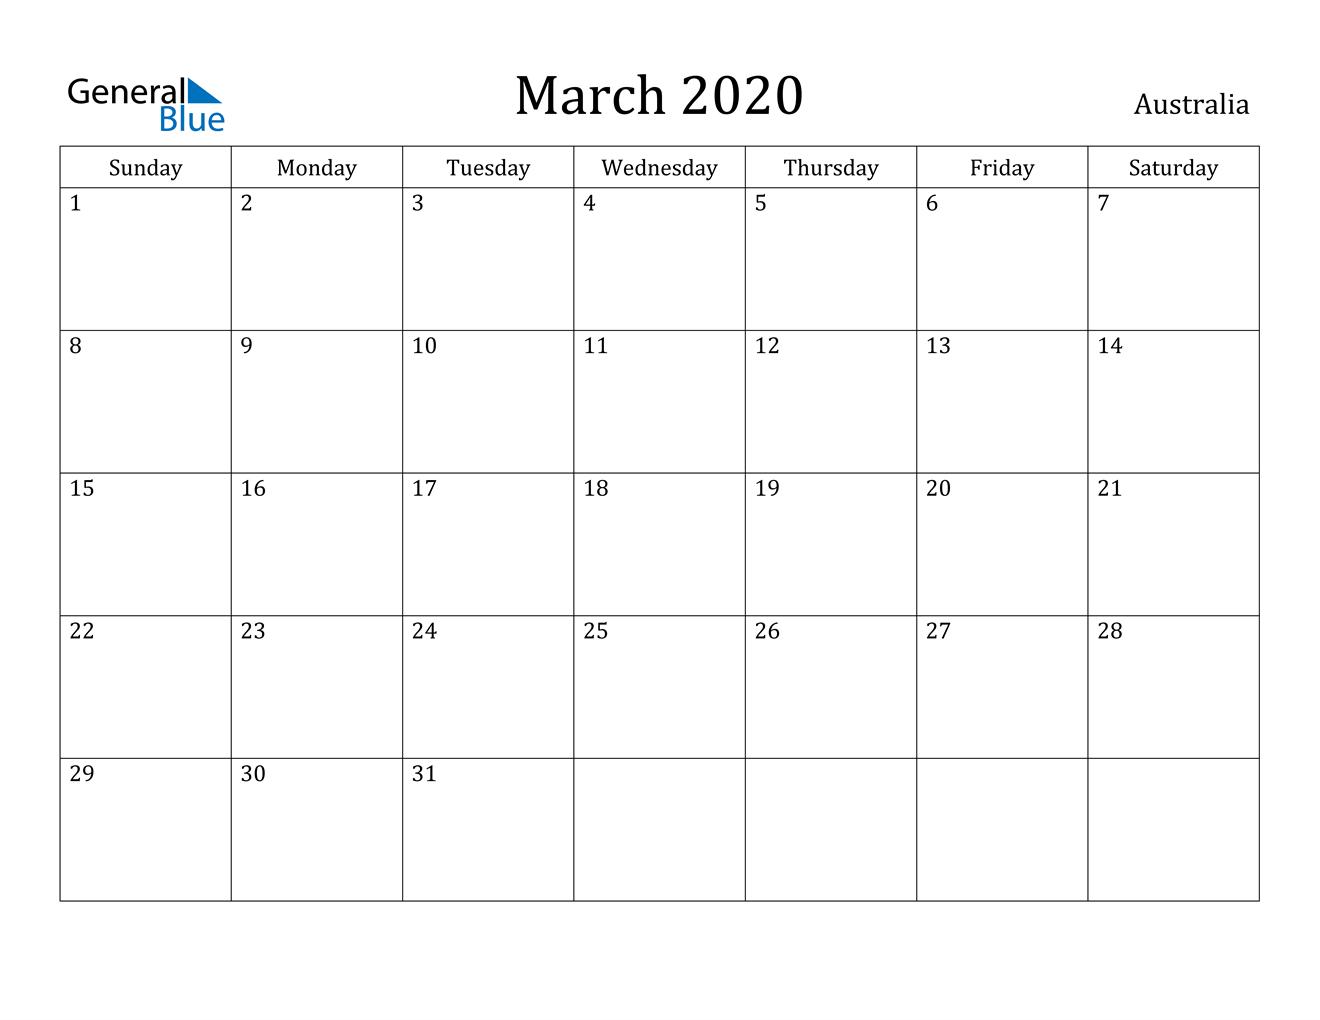 March 2020 Calendar - Australia